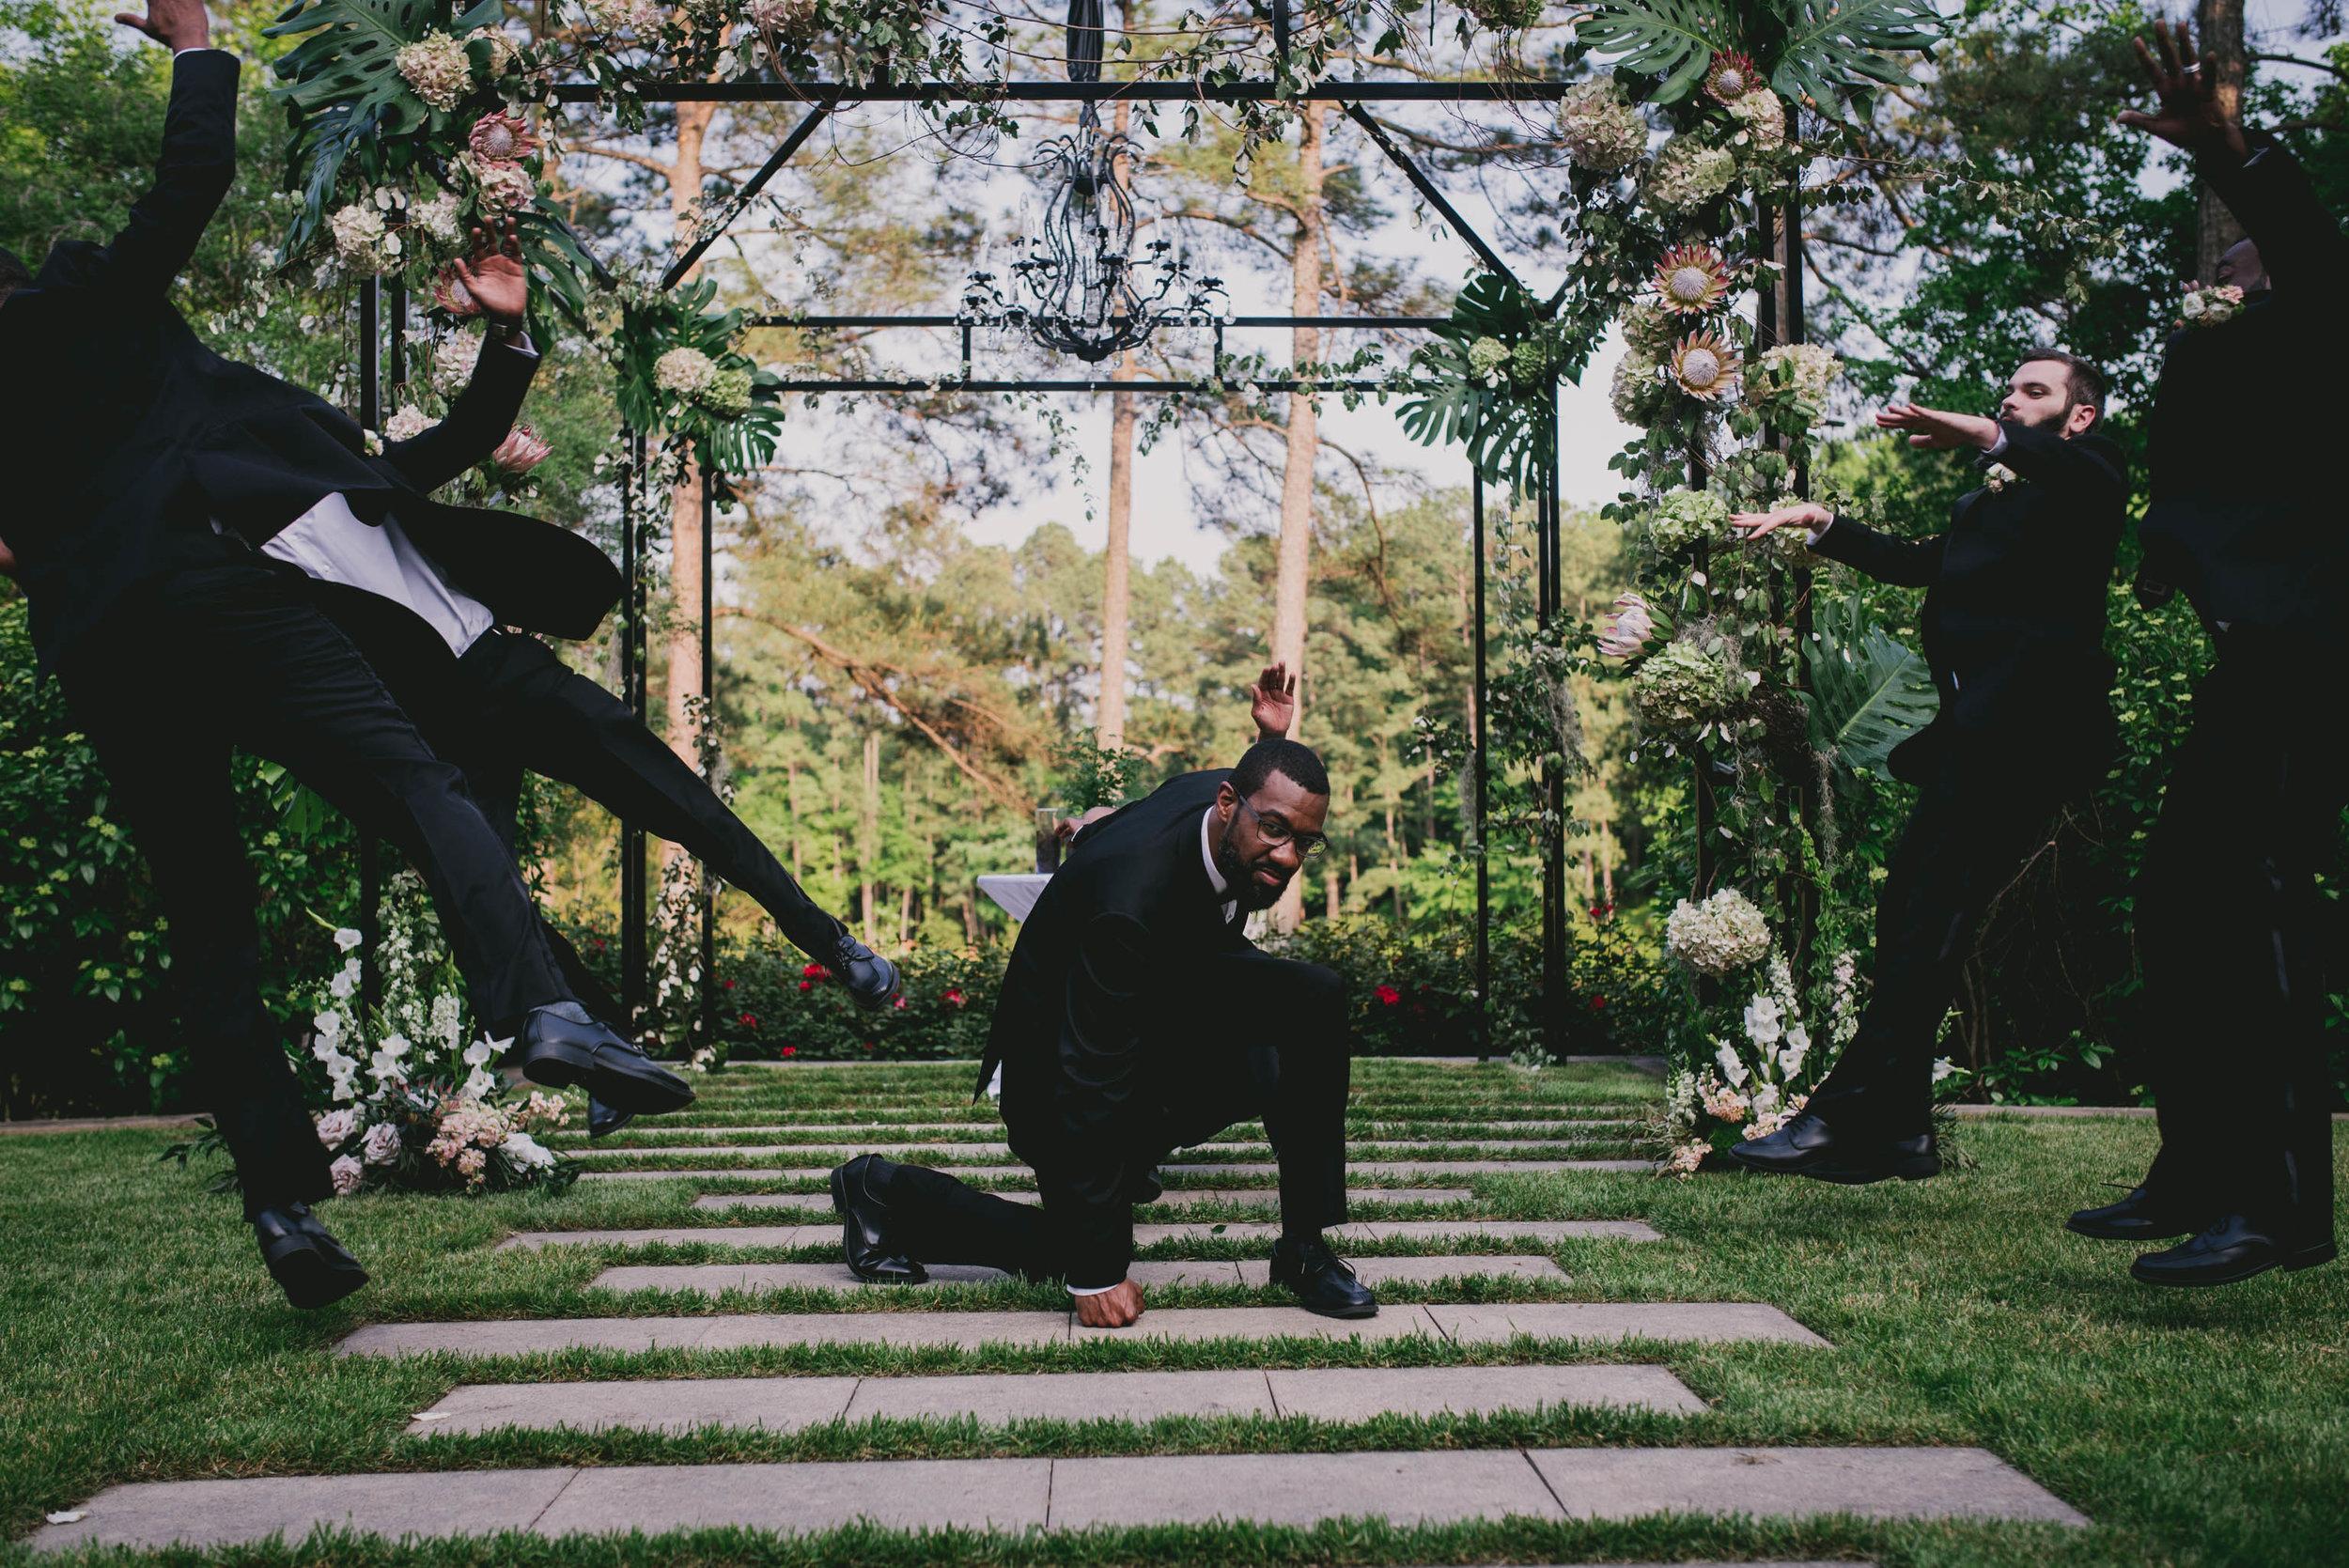 The groom loves superheroes so we made a hero photo of he and his groomsmen